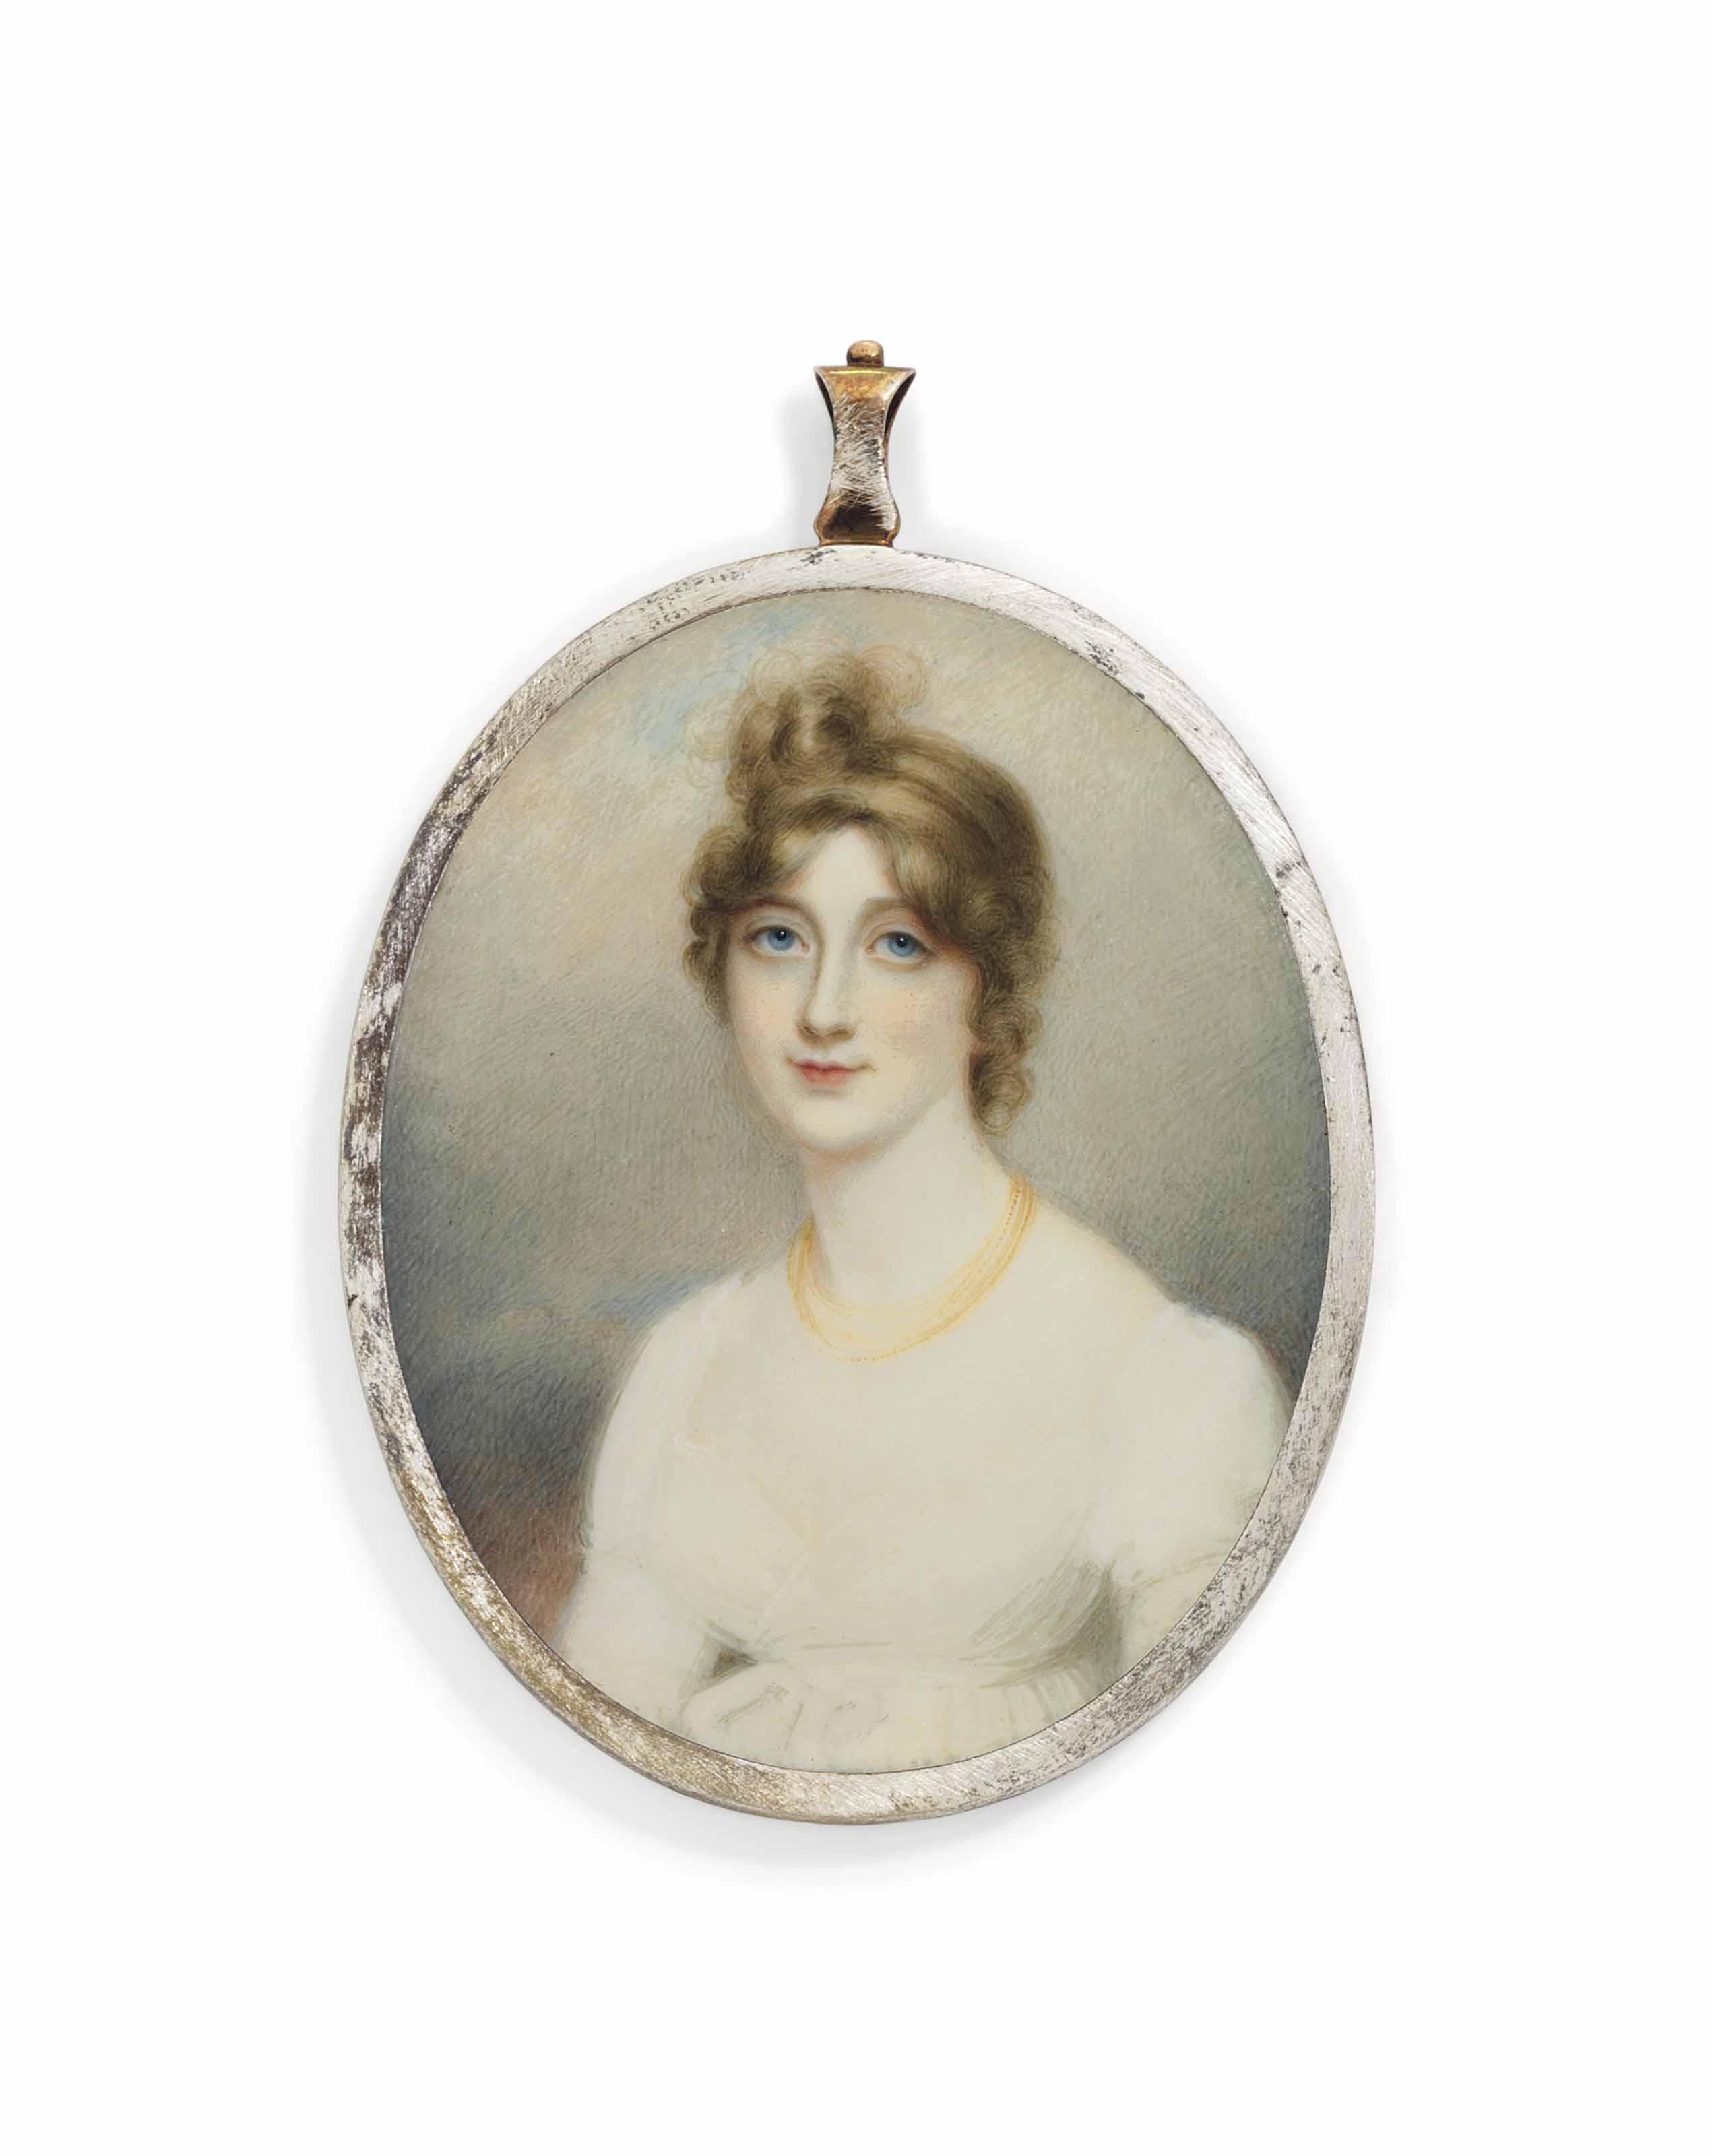 ANNE MEE, NÉE FOLDSONE (BRITISH, CIRCA 1770/75 - 1851)